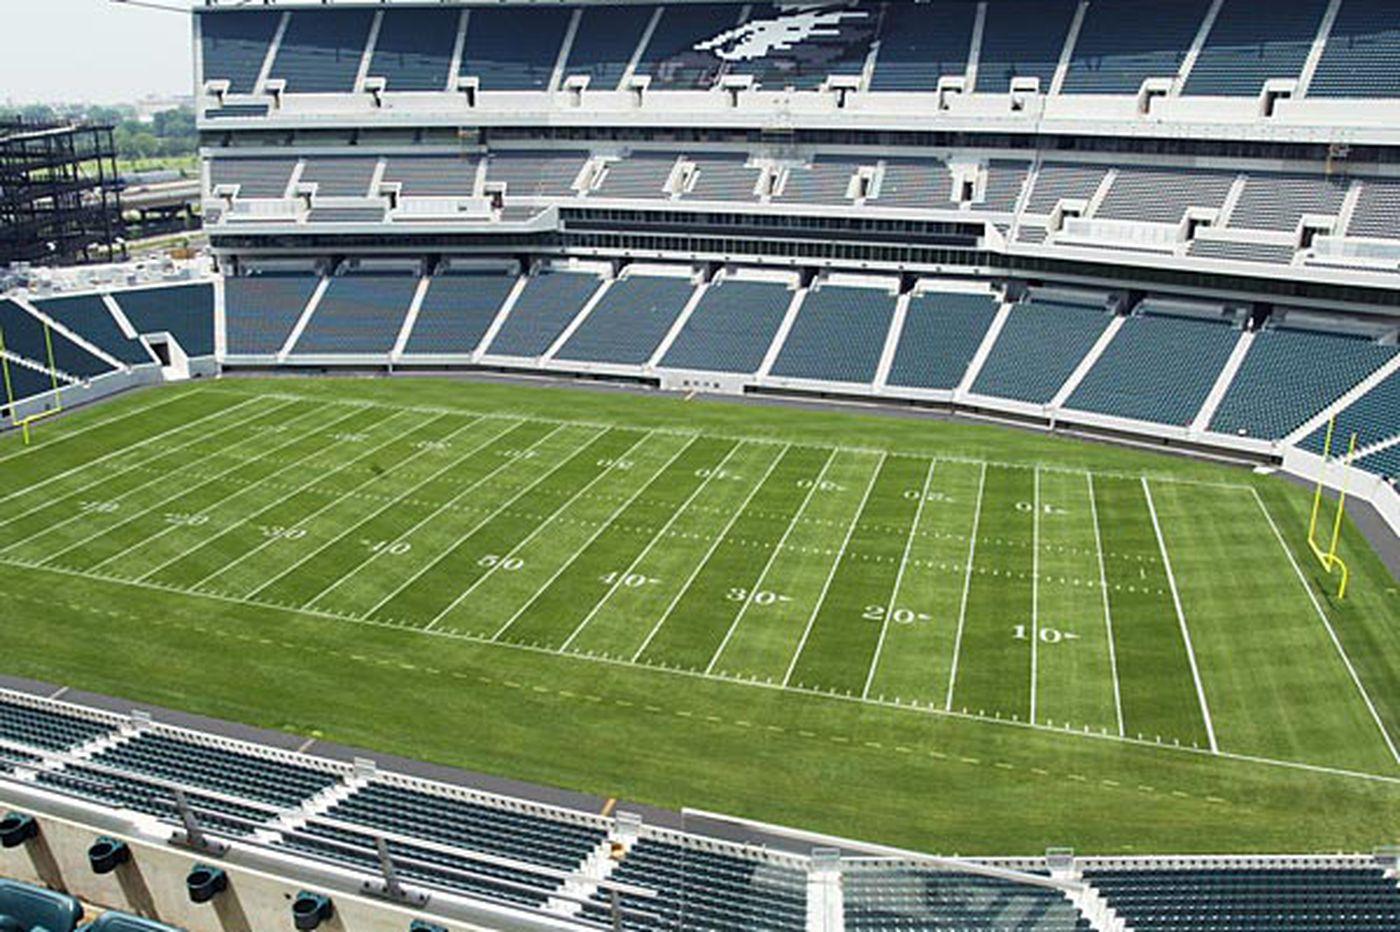 Eagles hope stadium renovations will help in Super Bowl bid